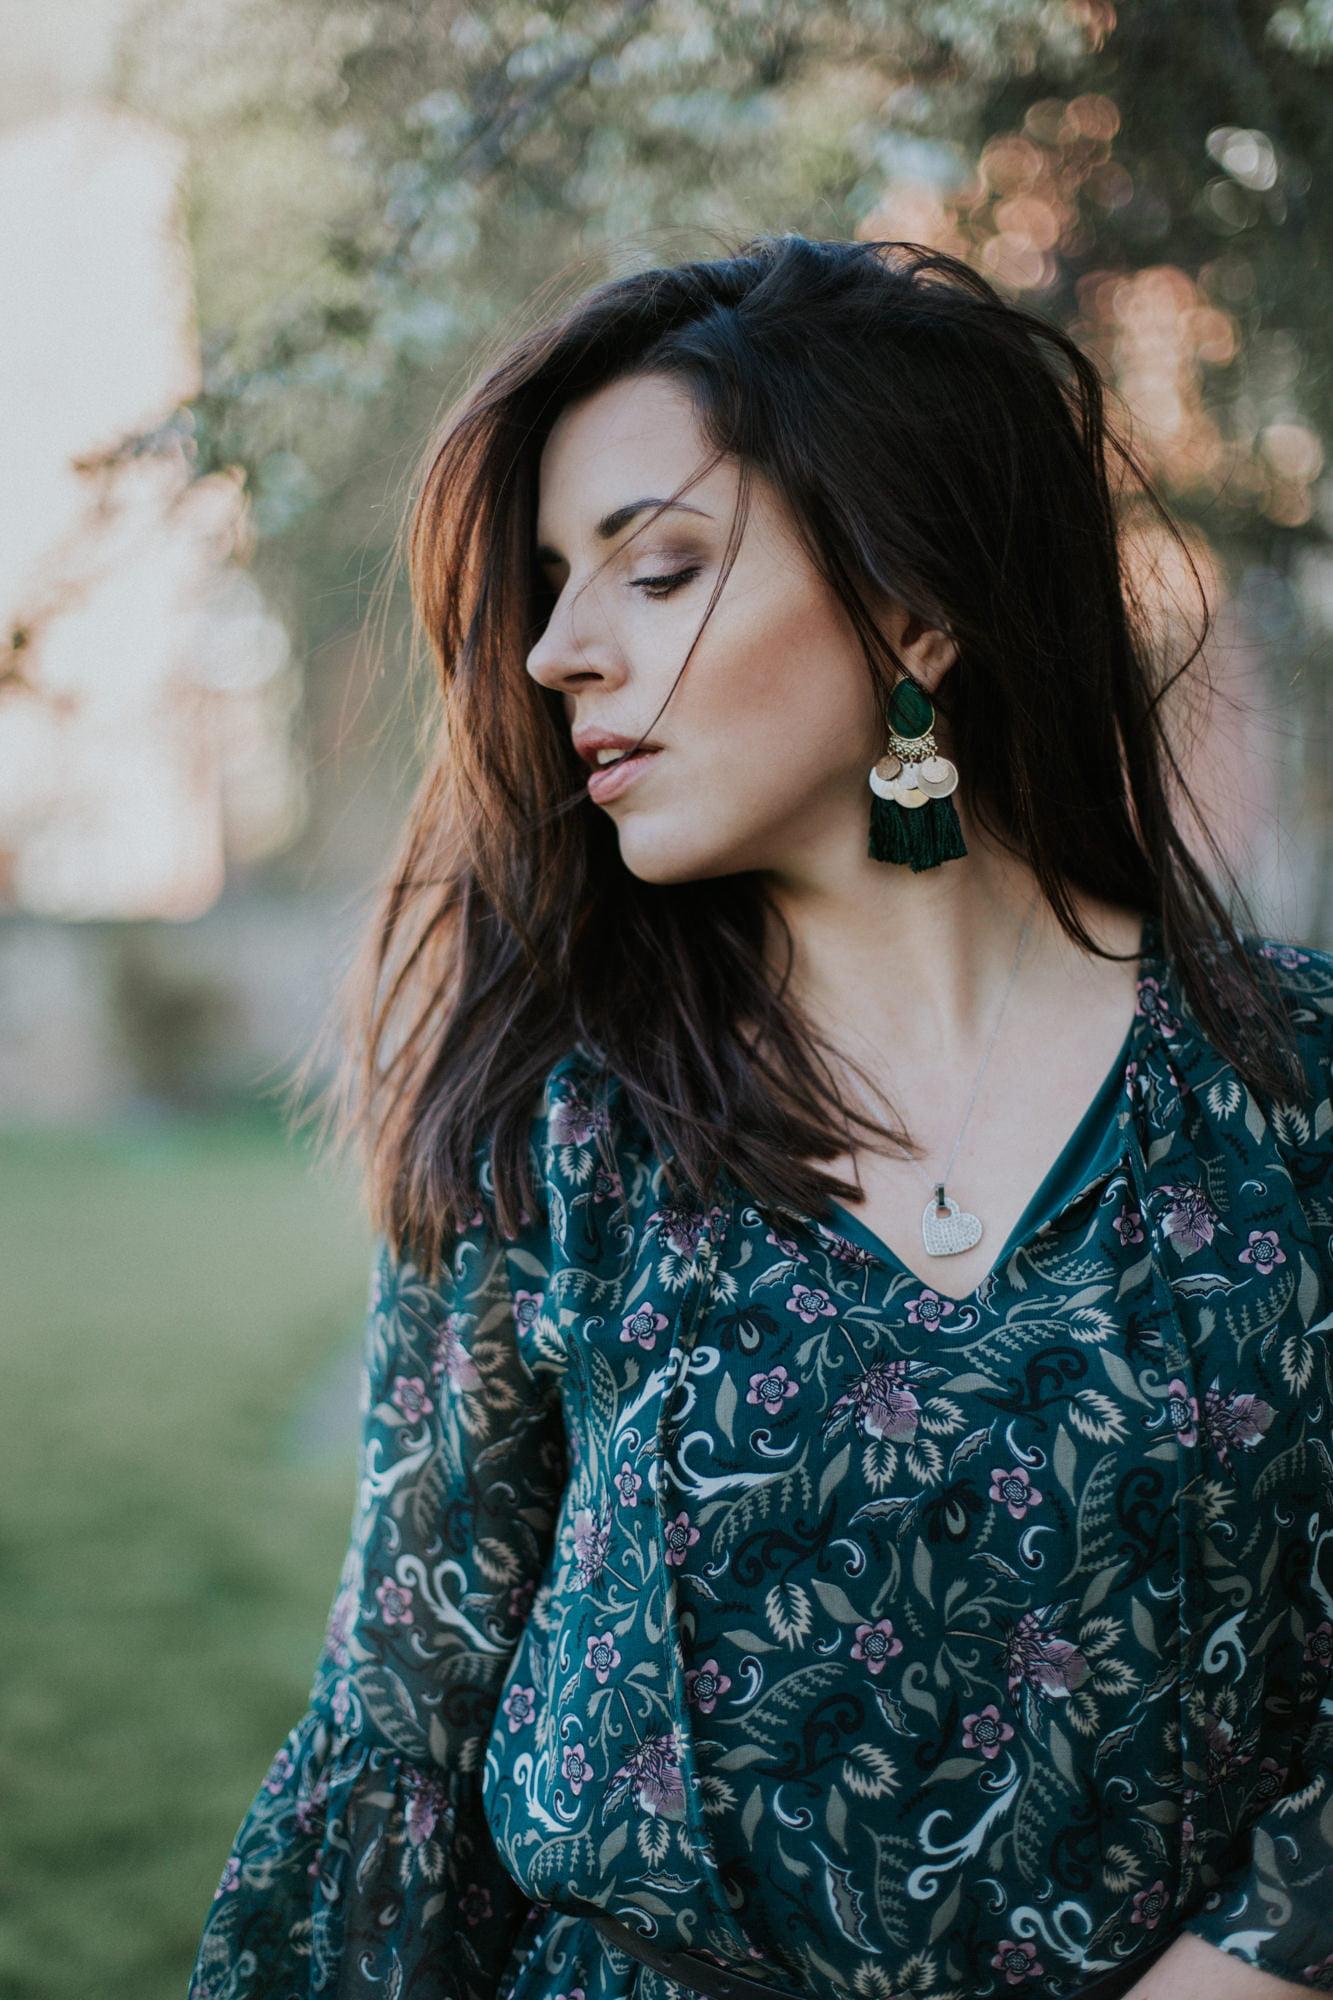 Edinburgh Portrait Photographer - Karolina